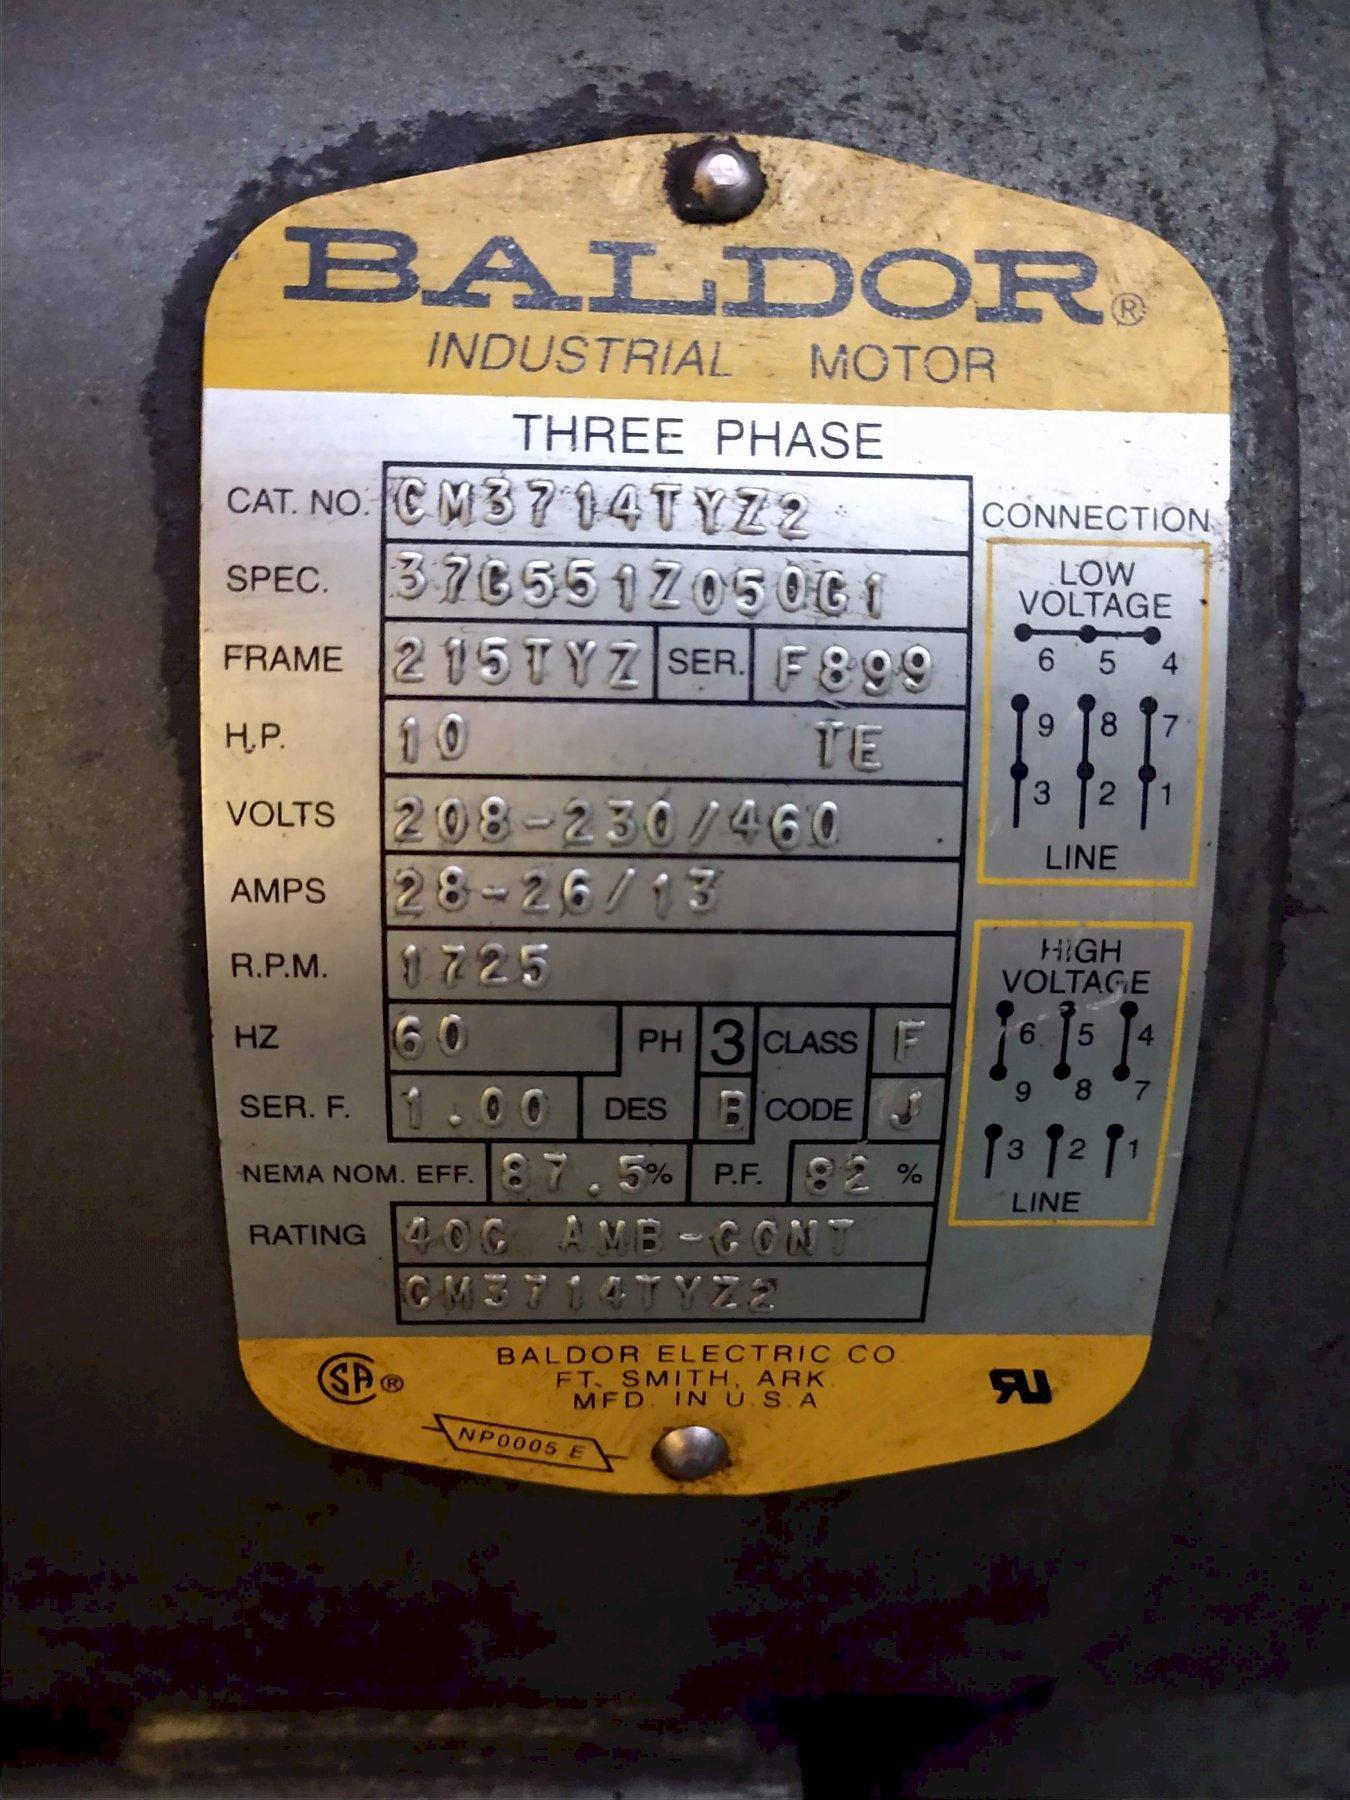 88 TON PIRANHA MODEL PII-88 DUAL OPERATOR HYDRAULIC IRONWORKER: STOCK #12898